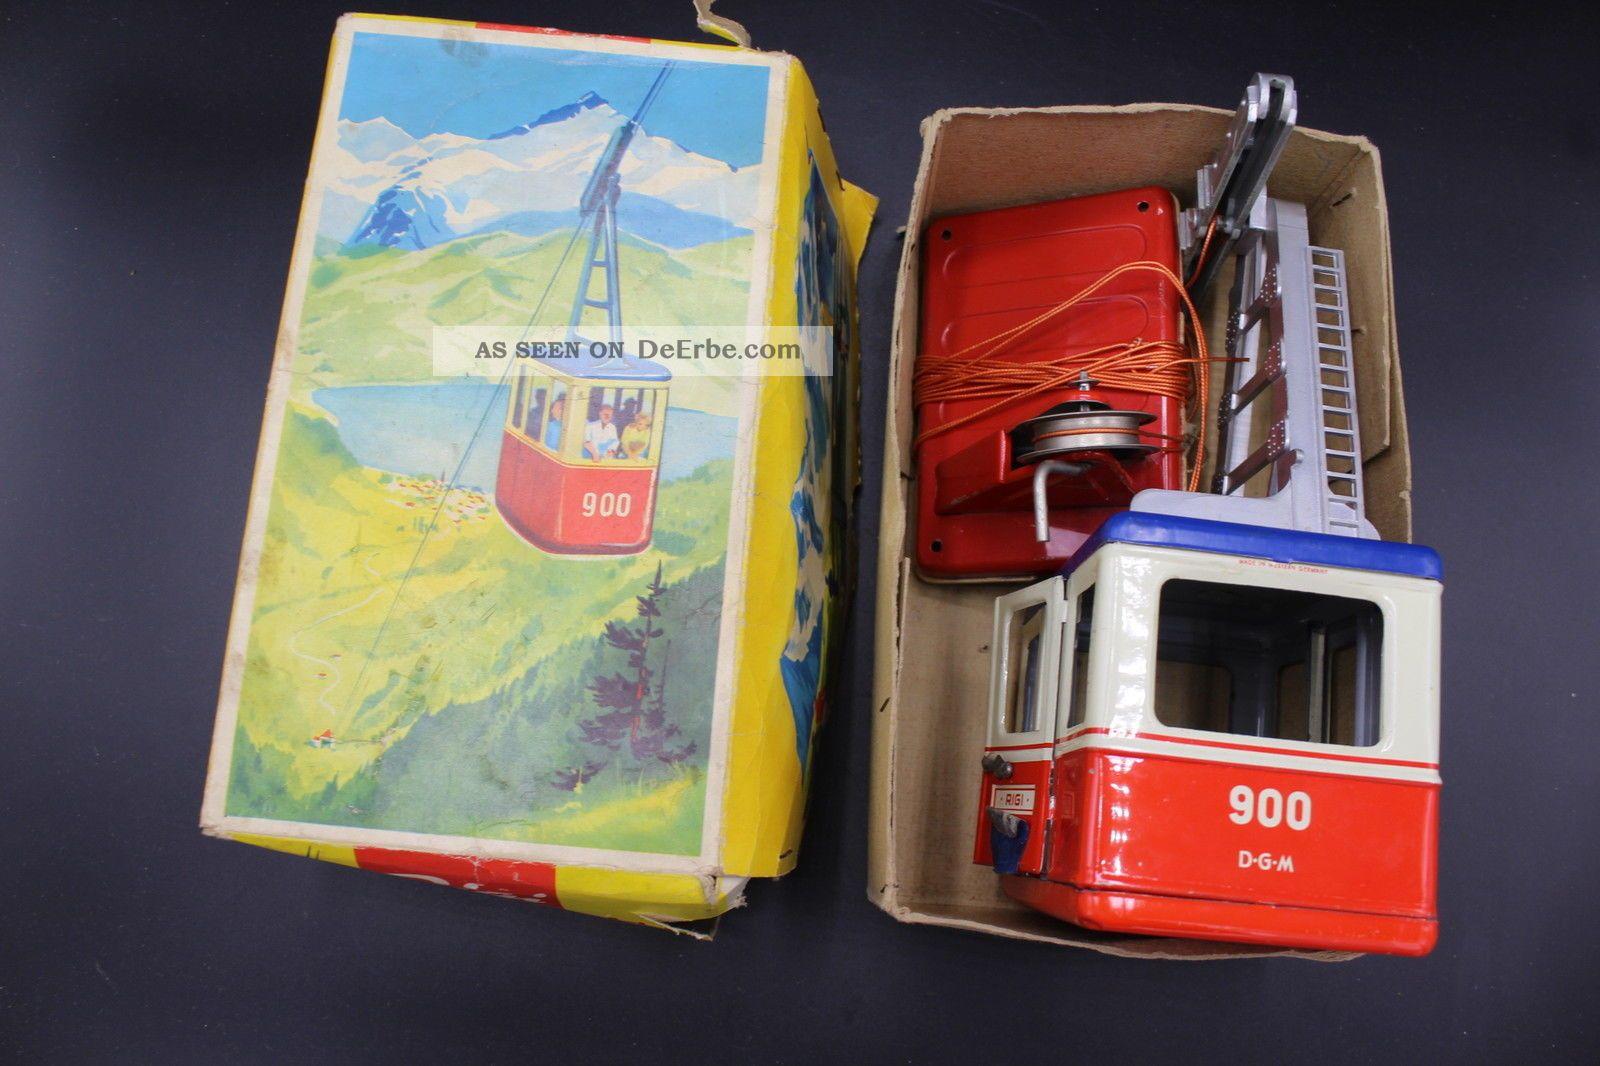 Orig.  Rigi Seilbahn Mit Kurbel & Karton Für Eisenbahn Blechspielzeug - Nr 900 Original, gefertigt 1945-1970 Bild